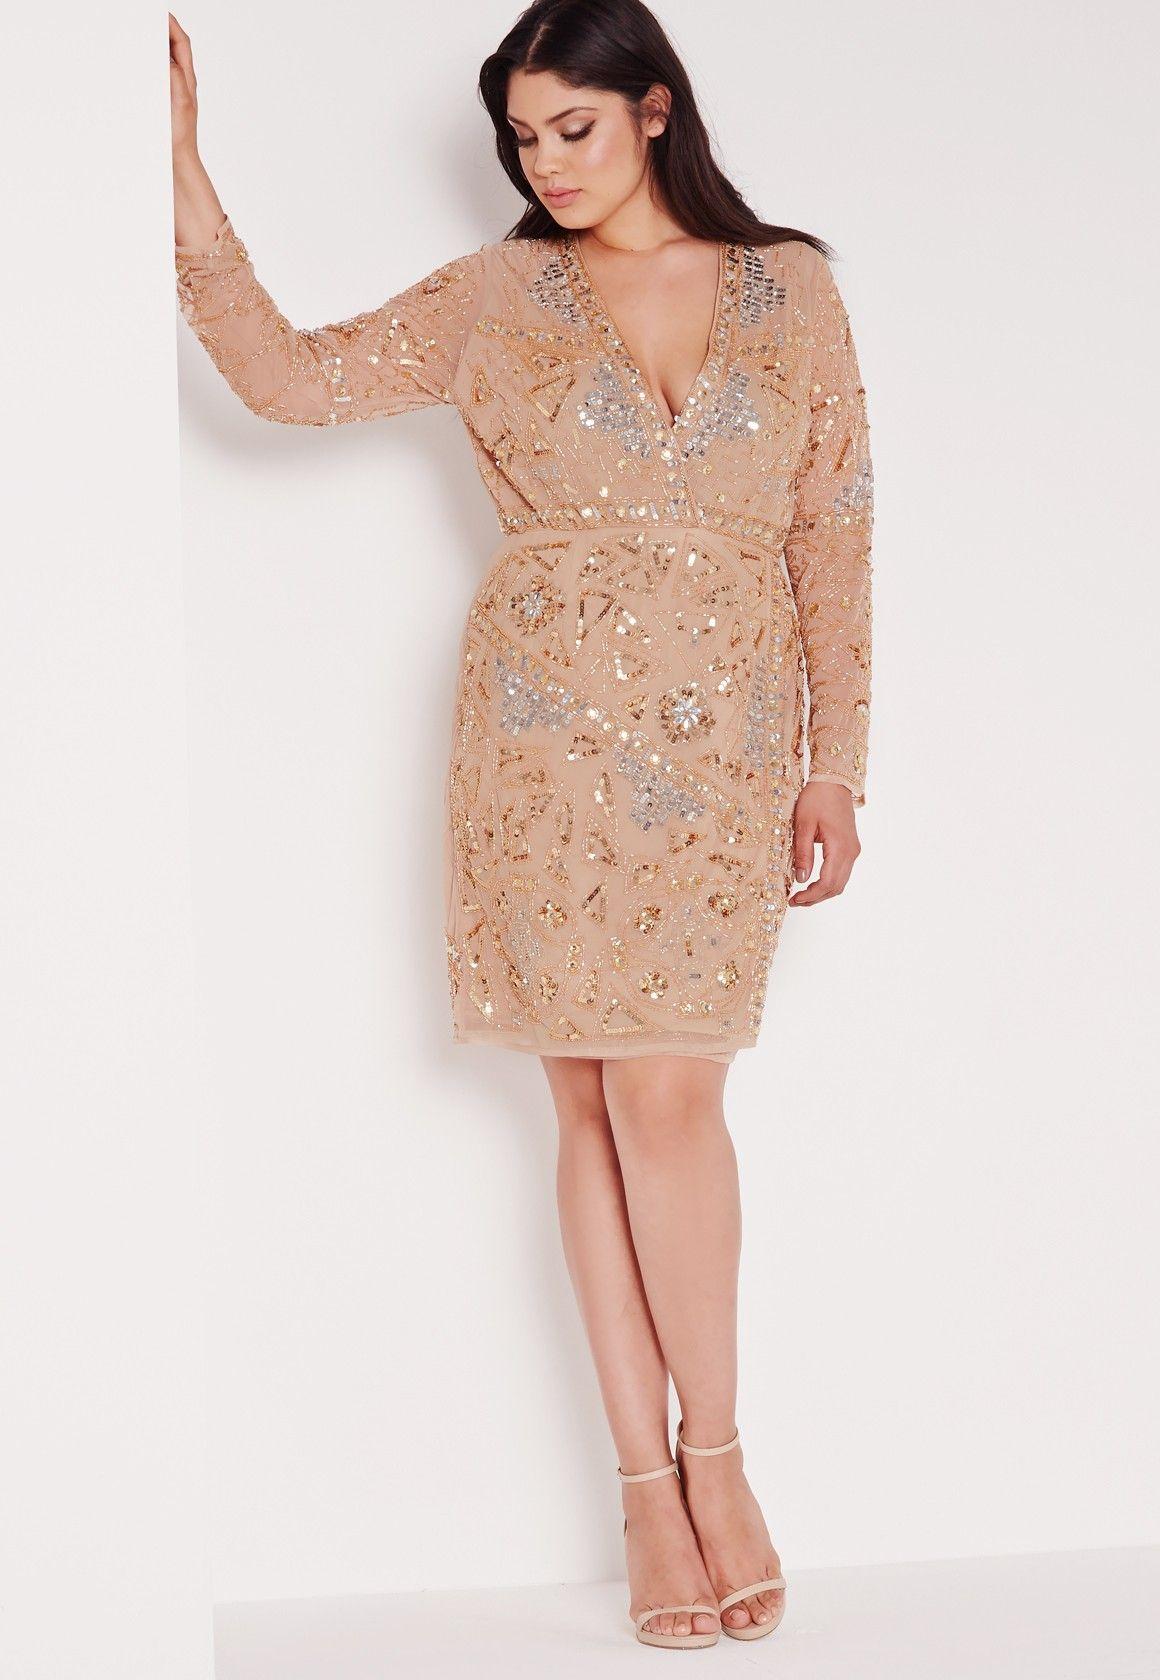 Missguided - Plus Size Premium Embellished Dress Gold ...